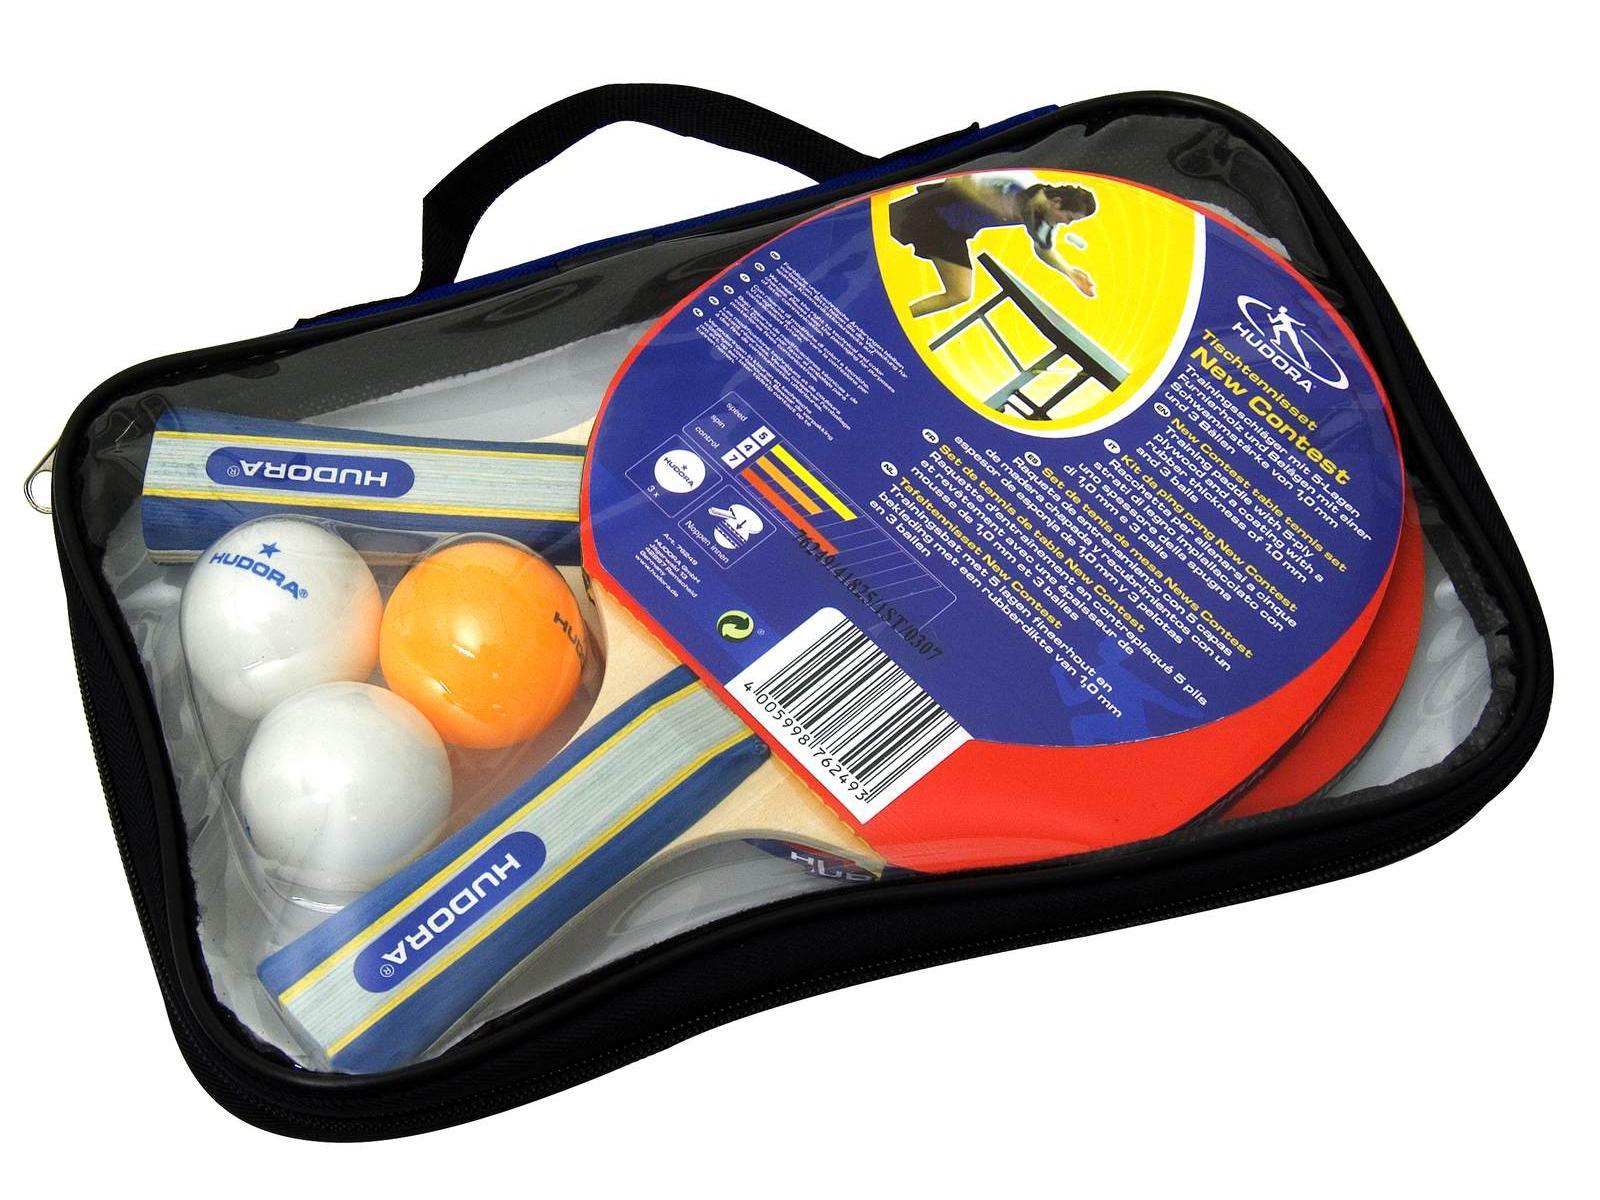 Set de tennis de table, 2 raquettes, 3 balles Hudora (Réf. 76249)